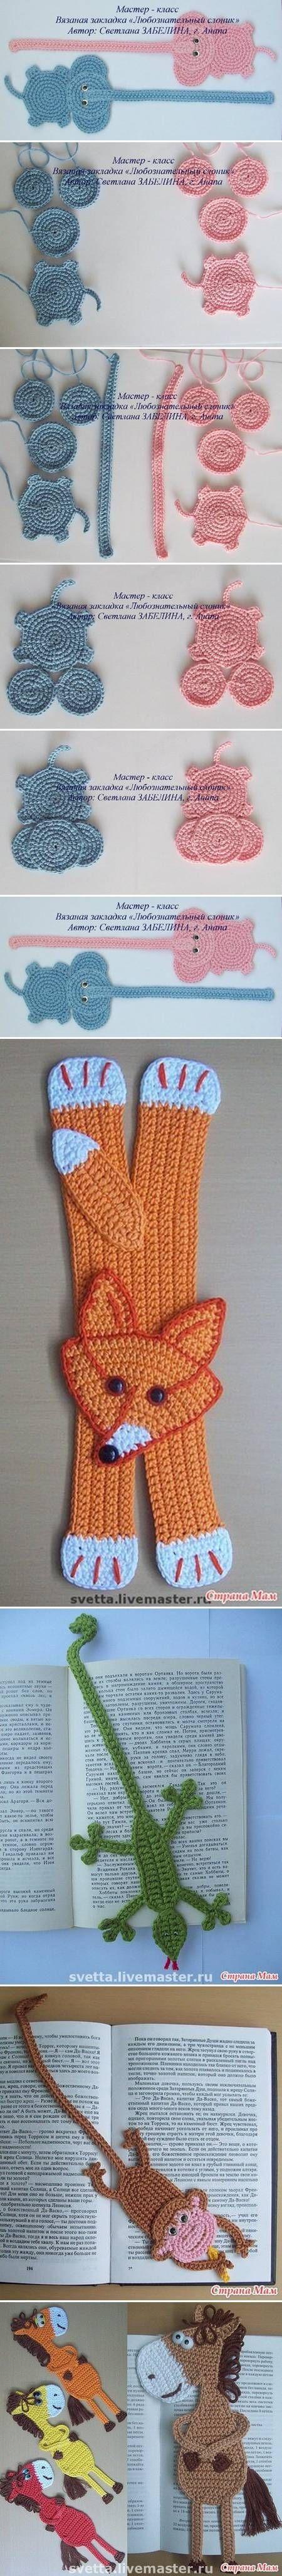 DIY Crochet Elephant Bookmark DIY Crochet Elephant Bookmark by diyforever